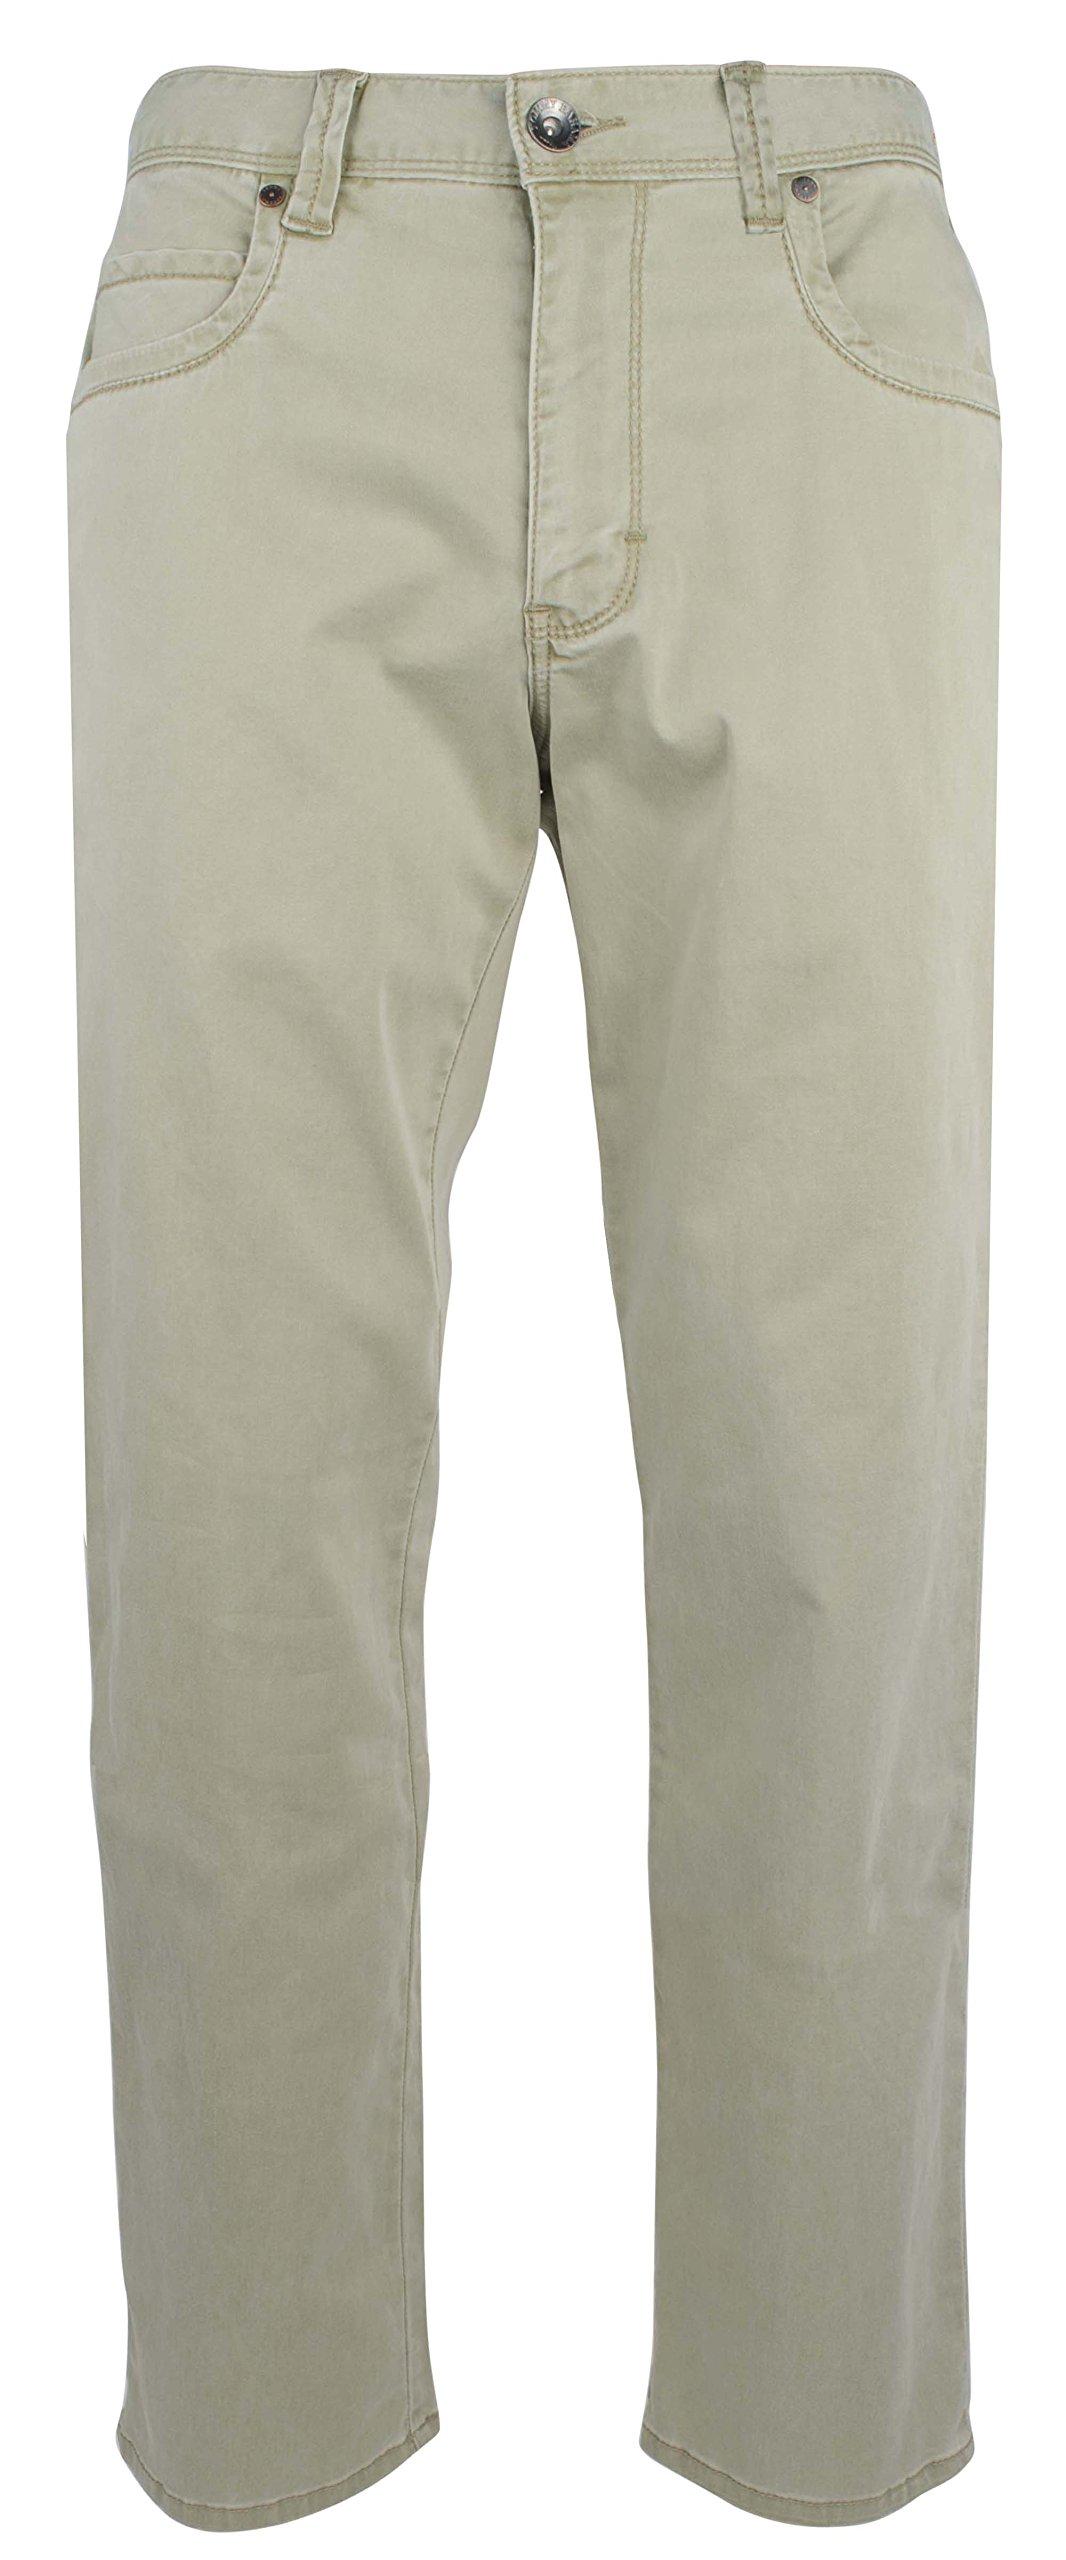 Tommy Bahama Men's Boracay Five Pocket Design Chino Pants (33WX34L, Khaki)